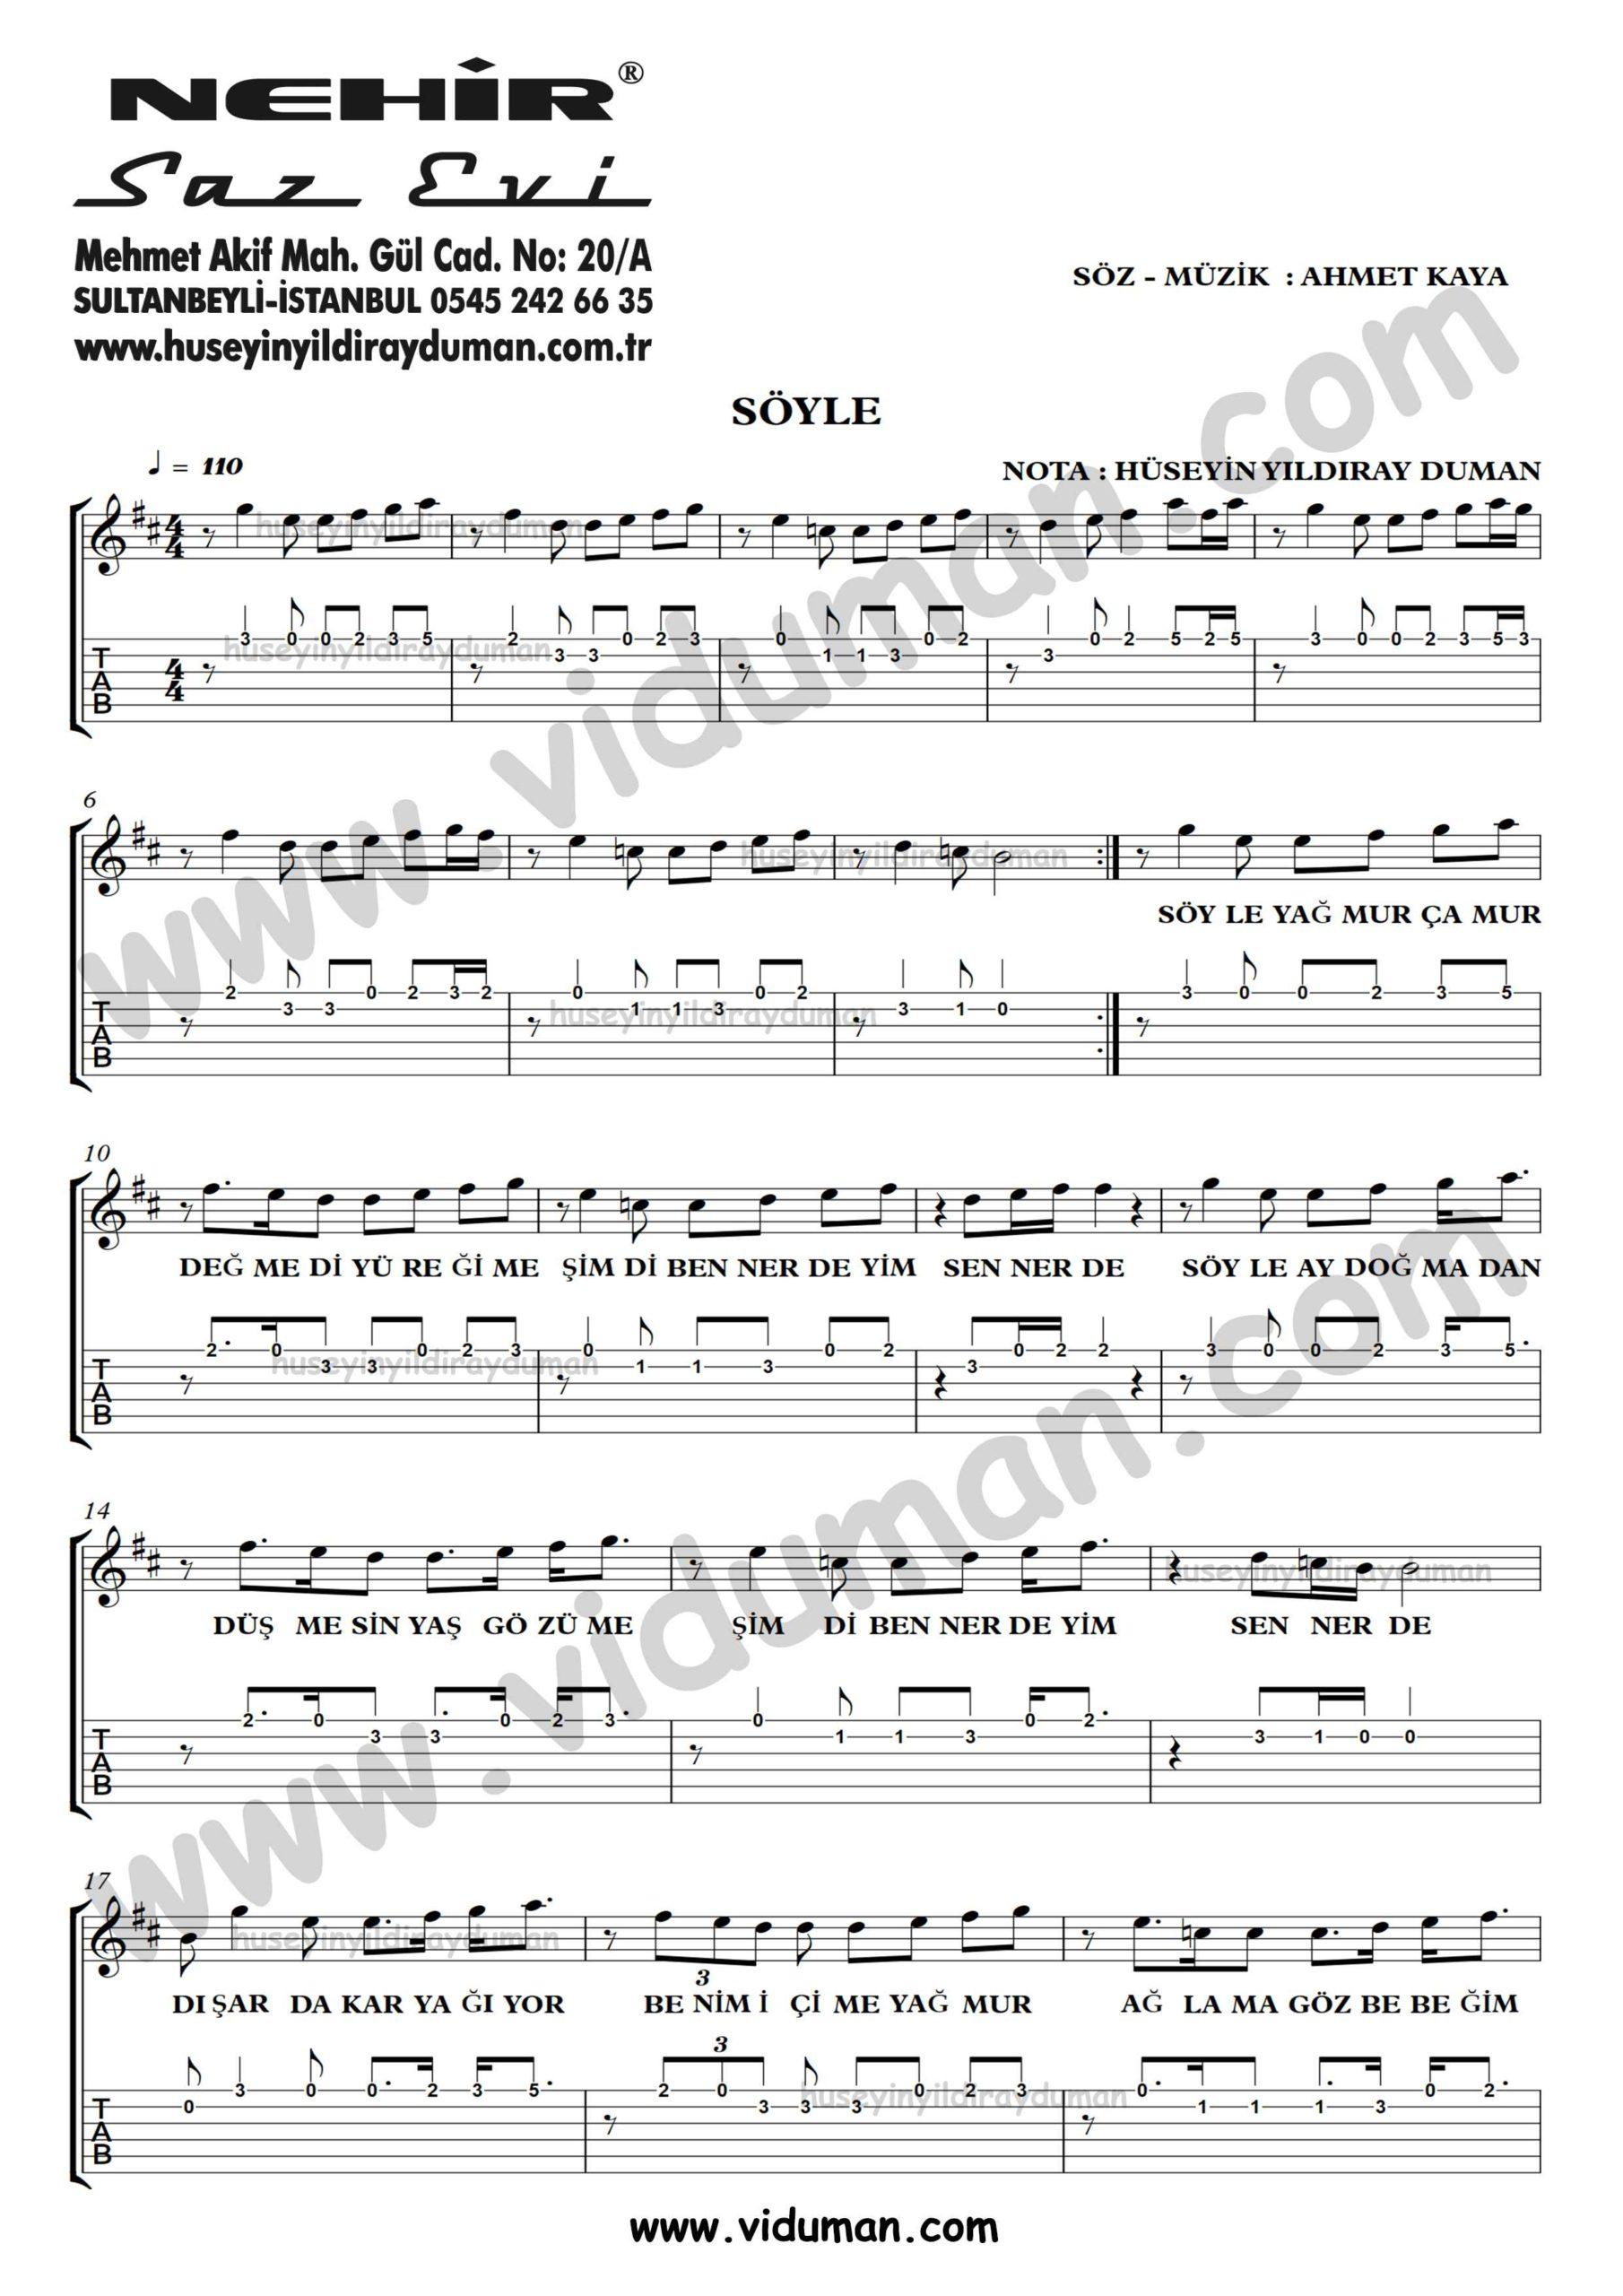 Soyle_1-Ahmet Kaya-Gitar Tab-Solo Notalari